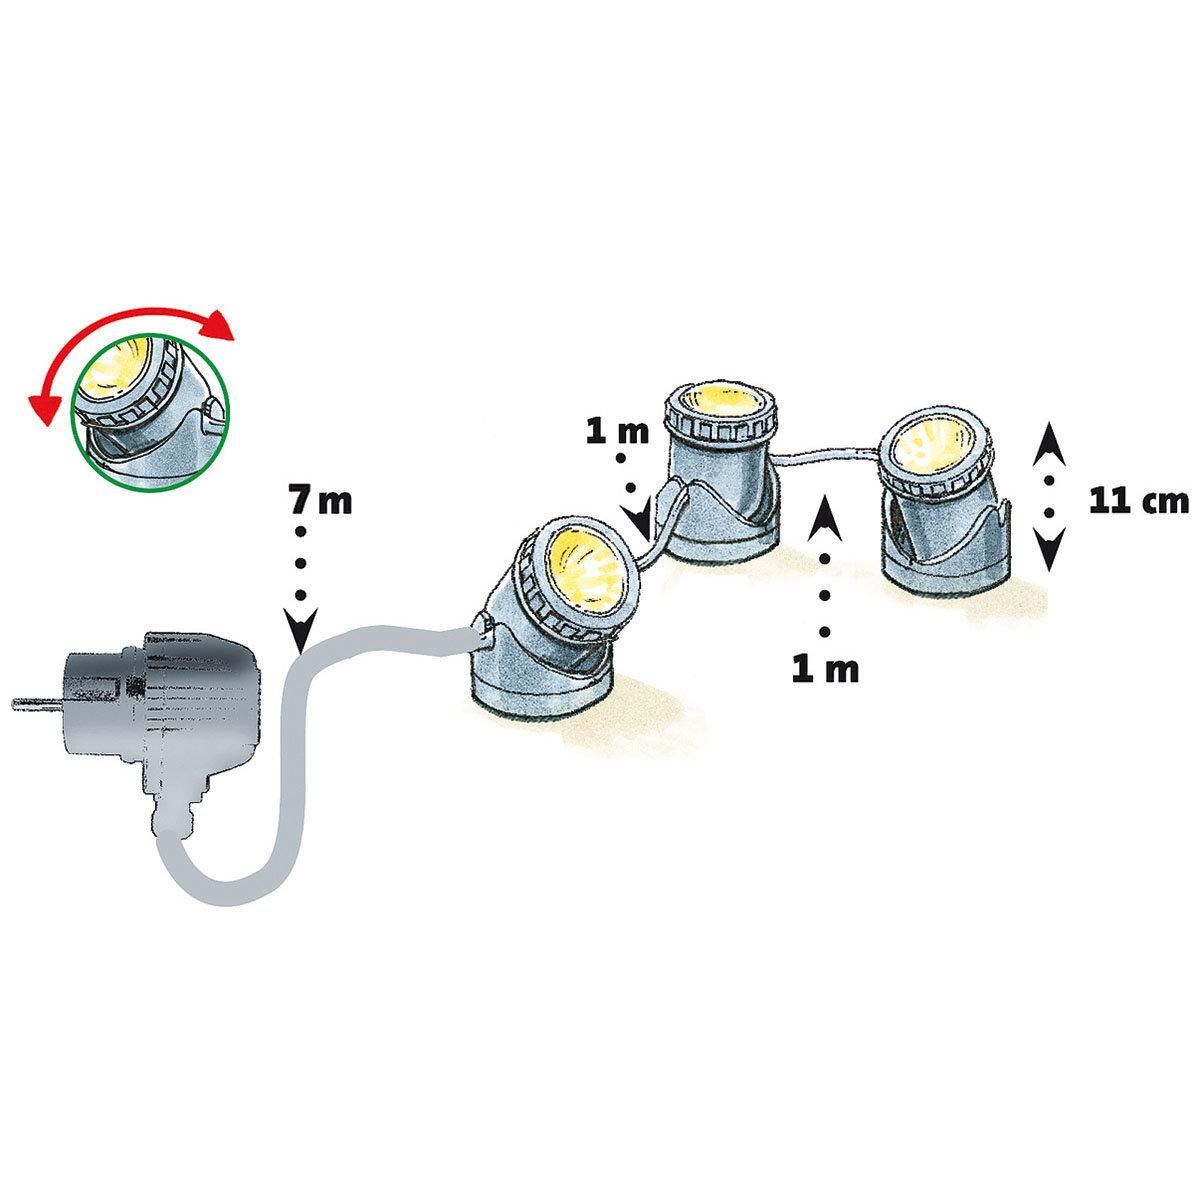 Aqua Light LED, 3er-Set Unterwasserspot mit Trafo | #3